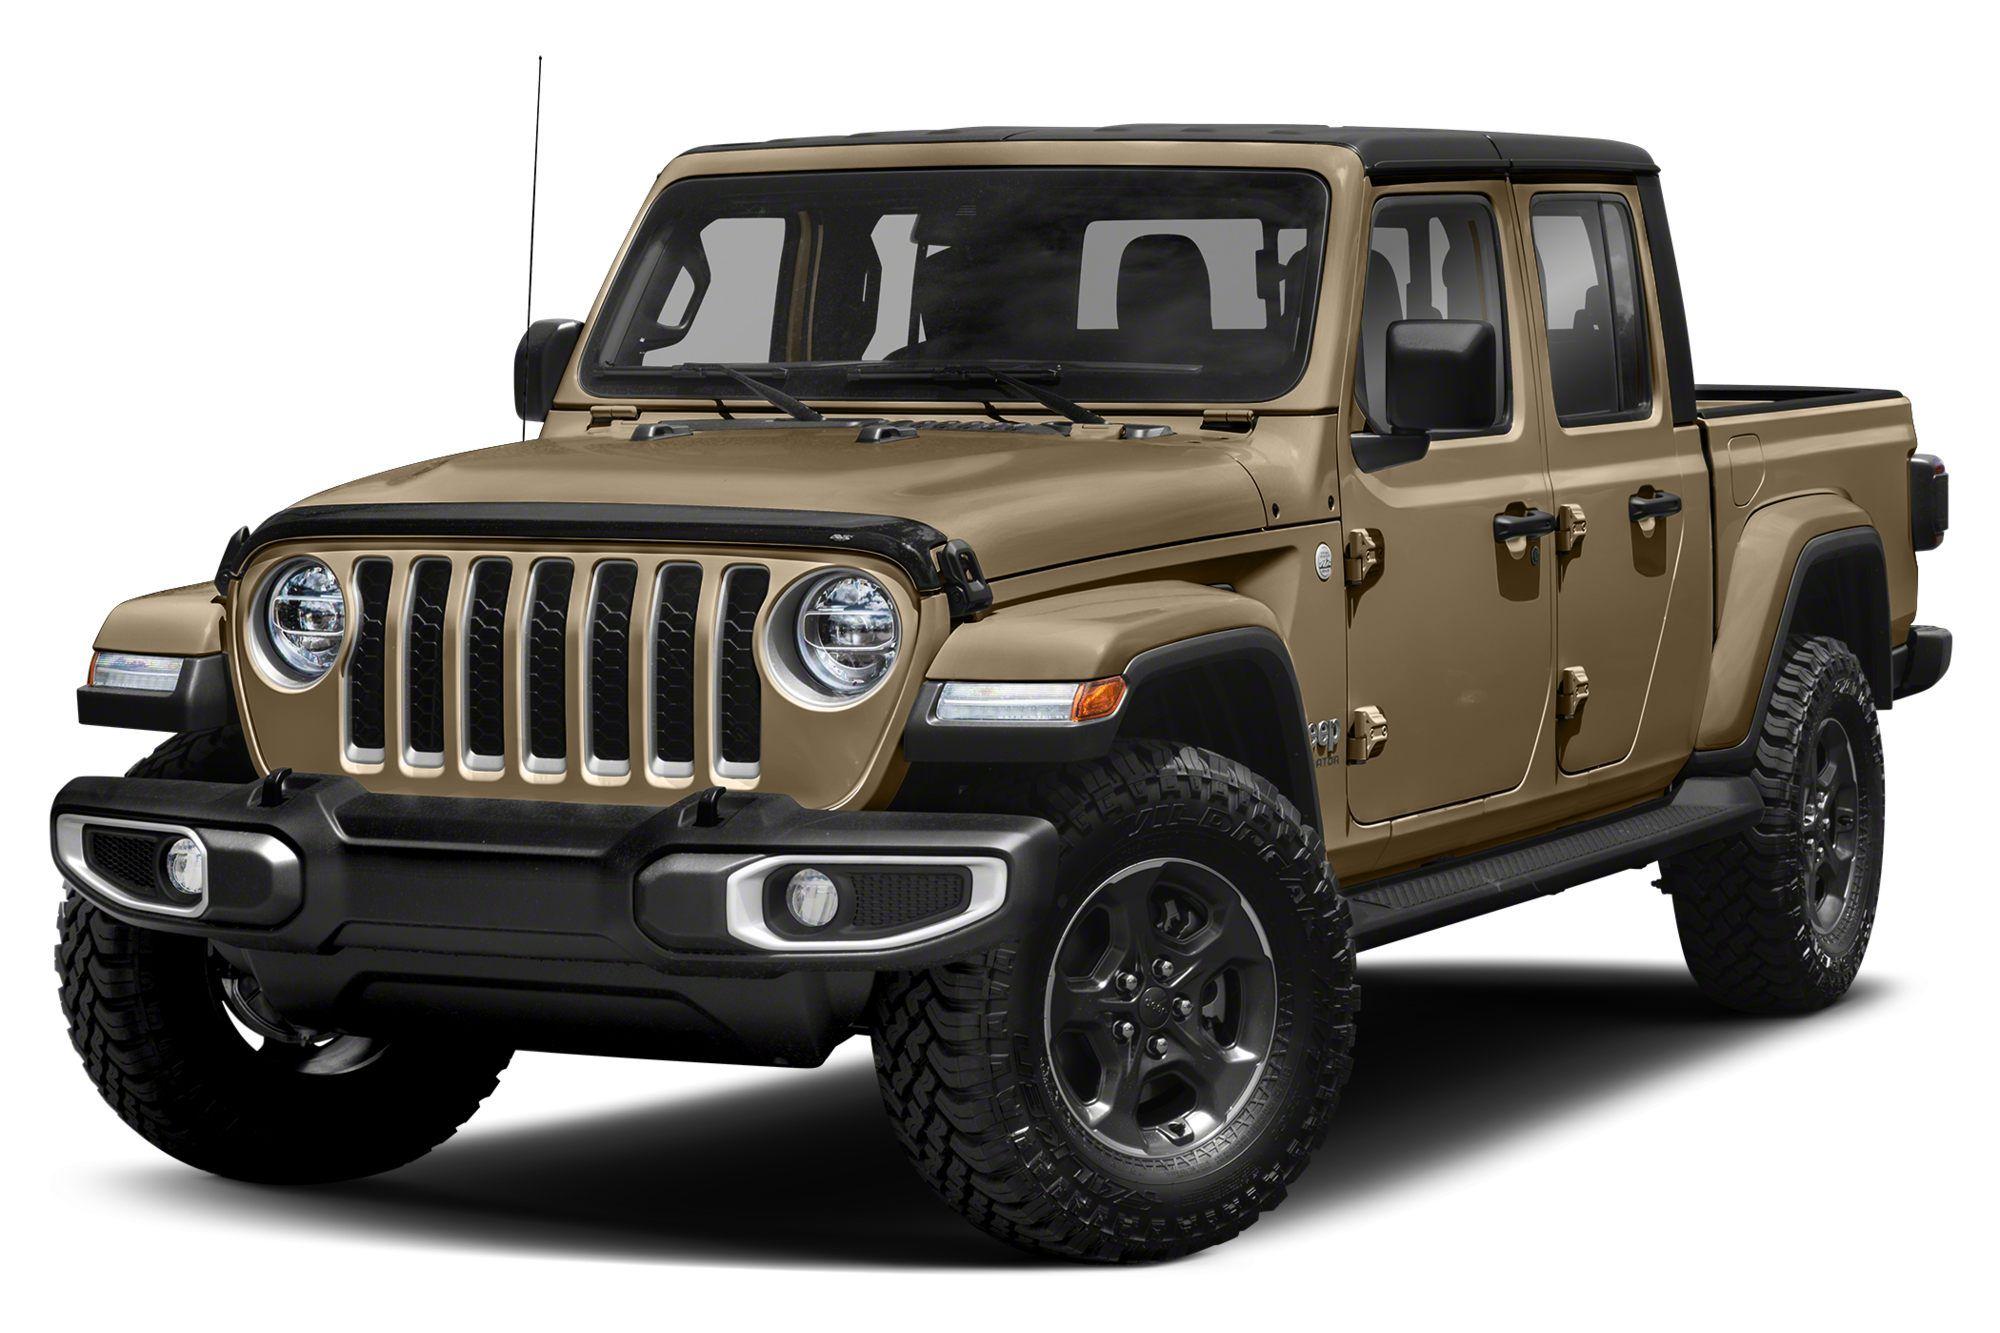 2020 Jeep Gladiator Recall Alert Jeep Gladiator Jeep Jeep Pickup